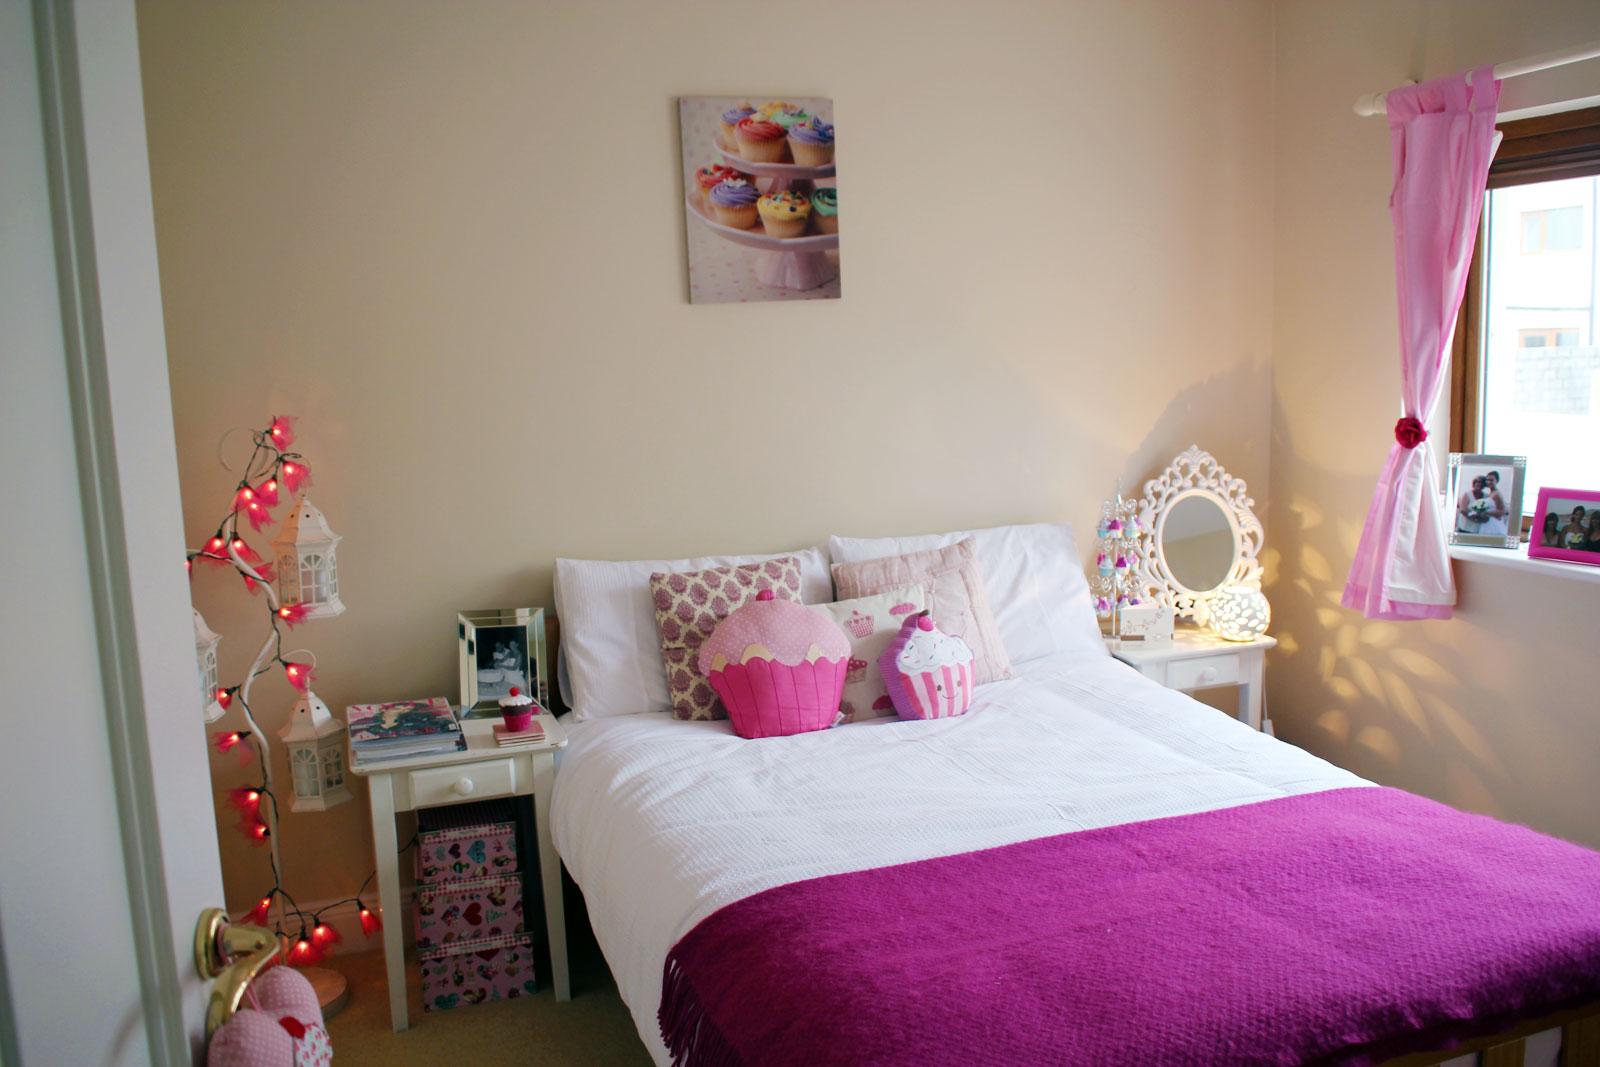 http://1.bp.blogspot.com/-dKBnTY82nrE/UVTTMXD7NPI/AAAAAAAAOgU/FS-Ez_oLiH8/s1600/Anna-Saccone-Cupcake-Room.jpg